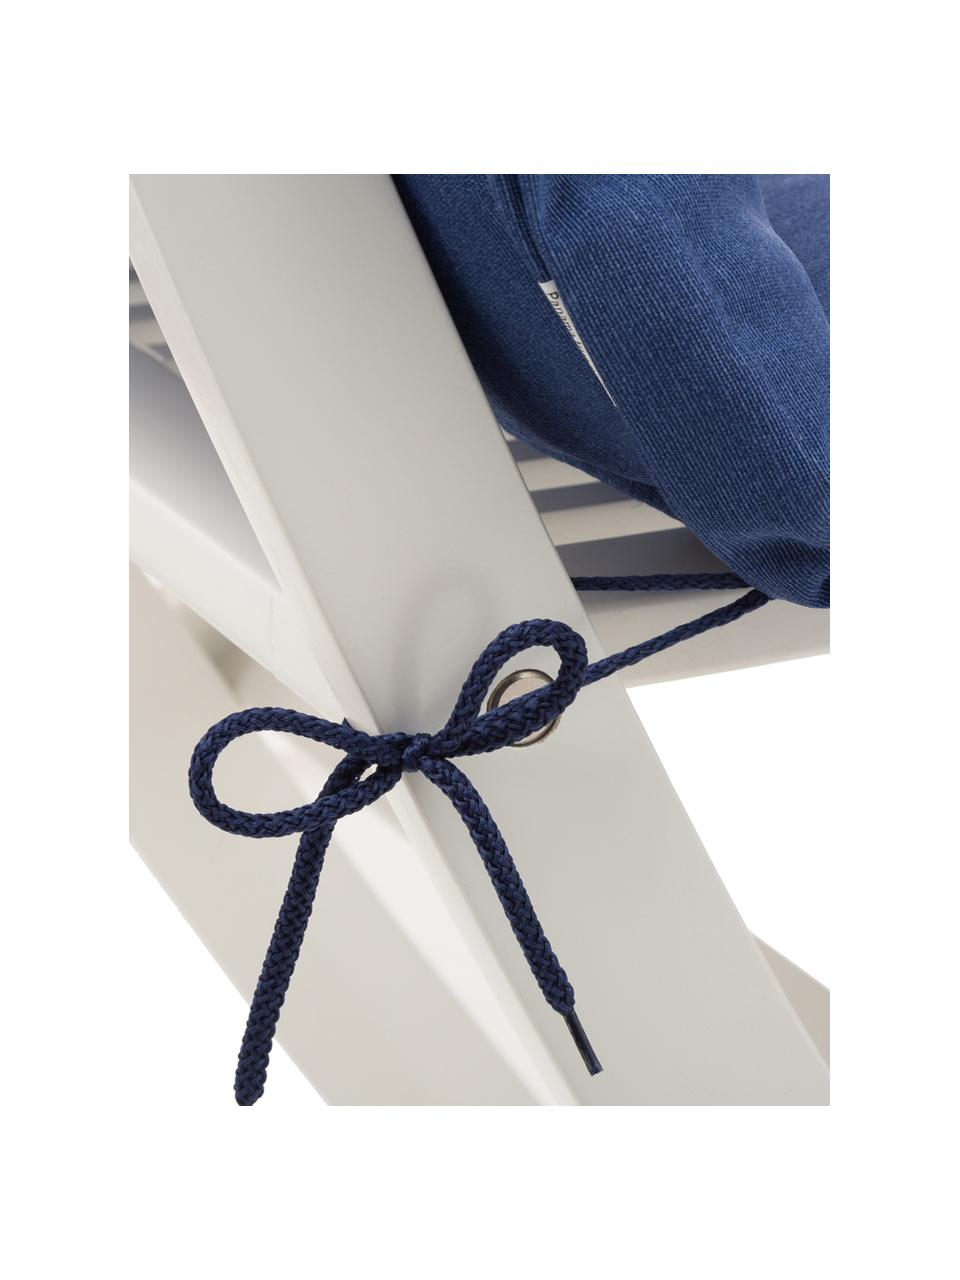 Einfarbige Hochlehner-Stuhlauflagen Panama in Marineblau, 2 Stück, Bezug: 50% Baumwolle, 50%Polyes, Marineblau, 50 x 123 cm